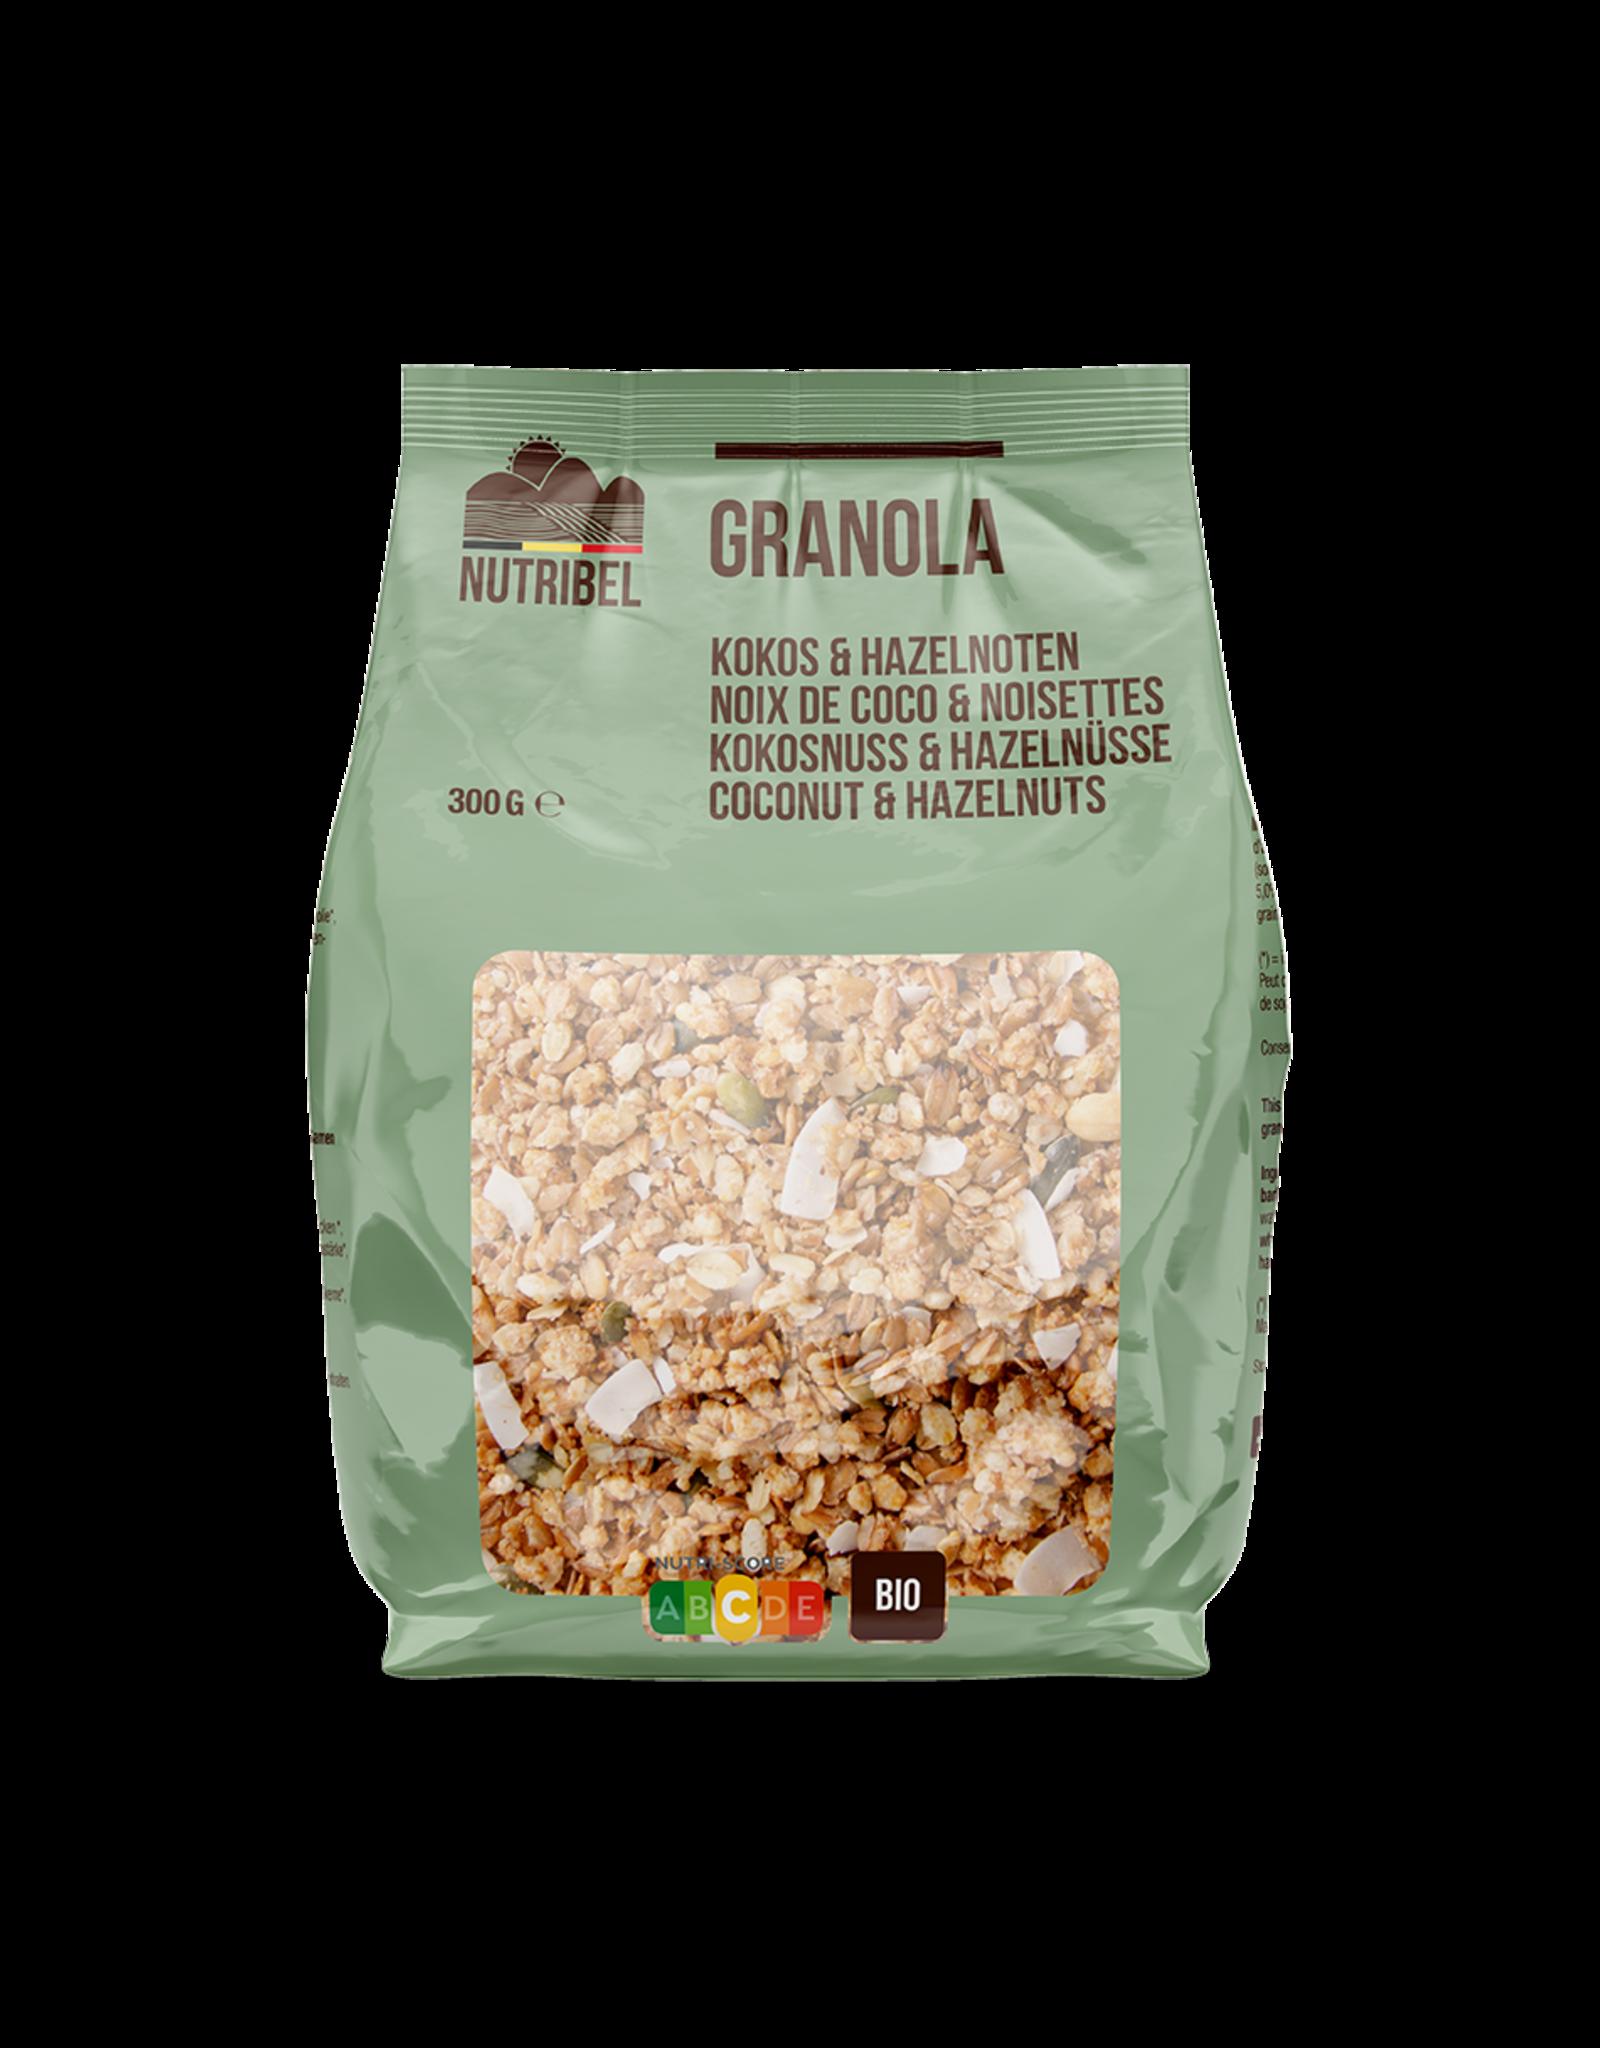 Nutribel Granola kokos hazelnoot bio 300g